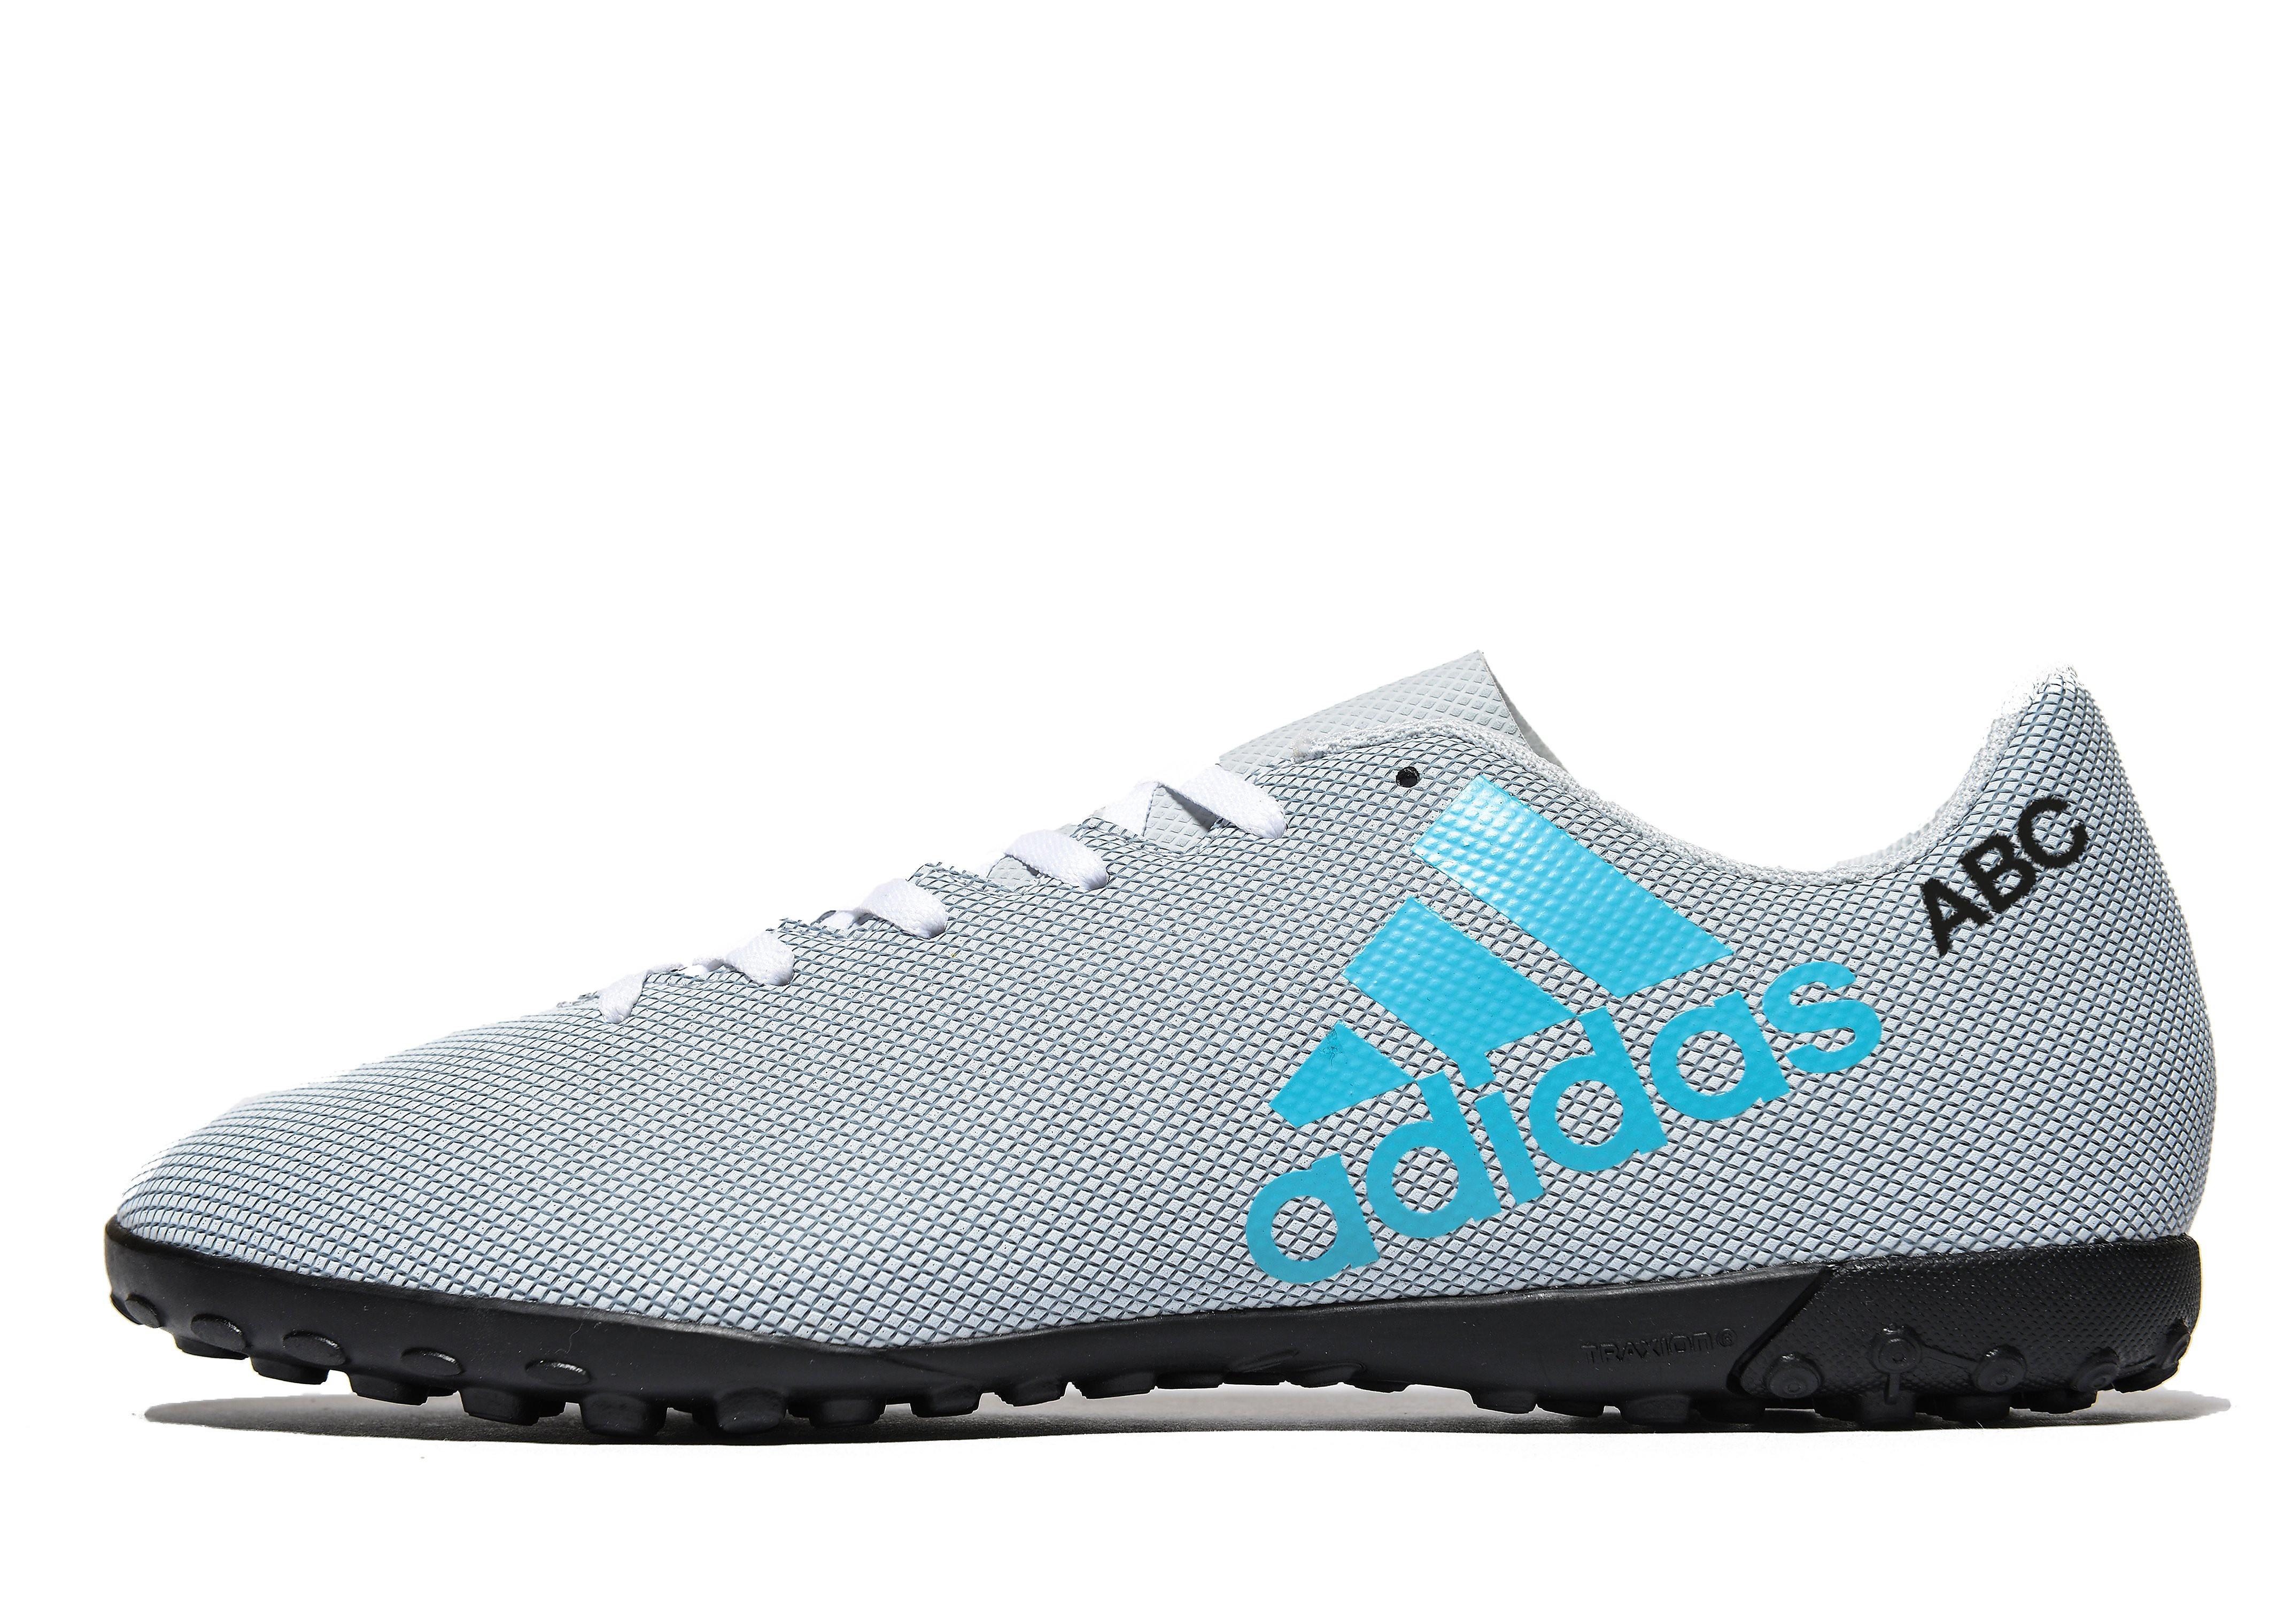 adidas Dust Storm X 17.4 Turf